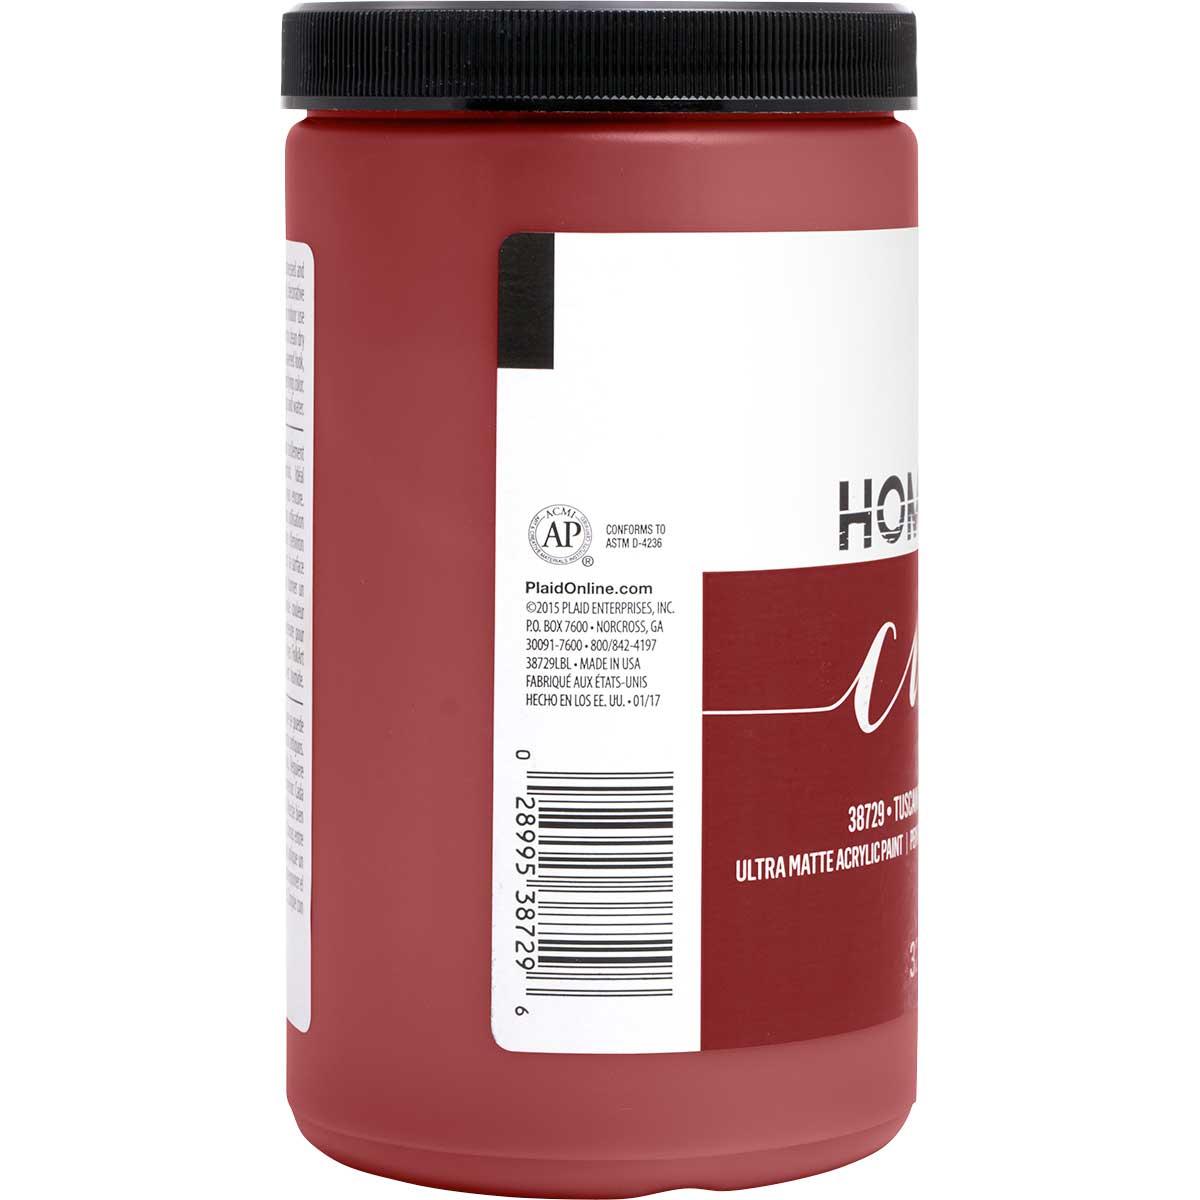 FolkArt ® Home Decor™ Chalk - Tuscan Red, 32 oz.